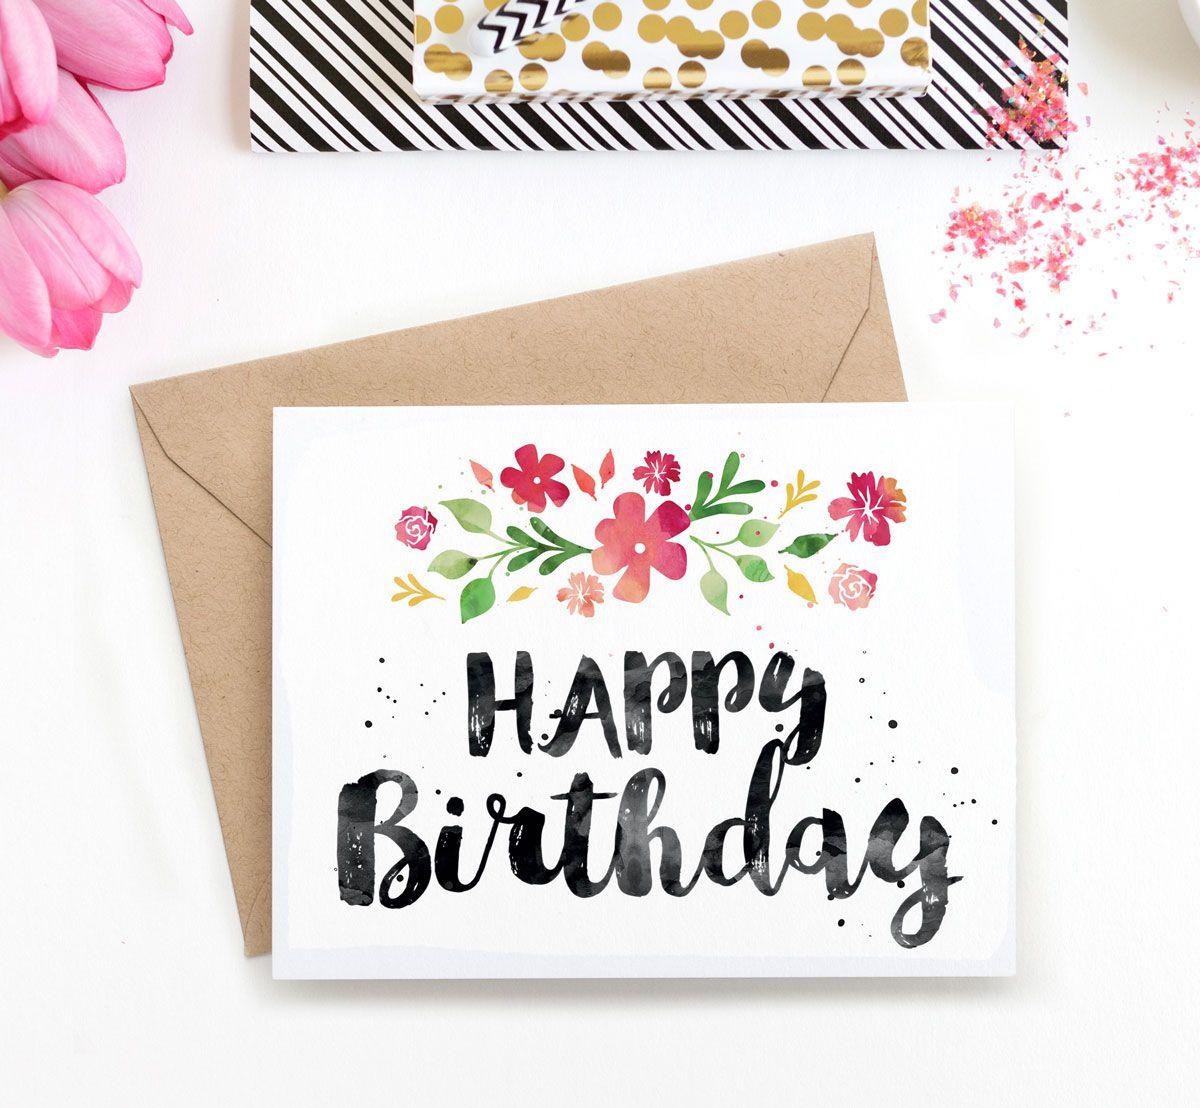 Printable Birthday Card Spring Blossoms Birthday Card Printable Watercolor Birthday Cards Birthday Cards Diy